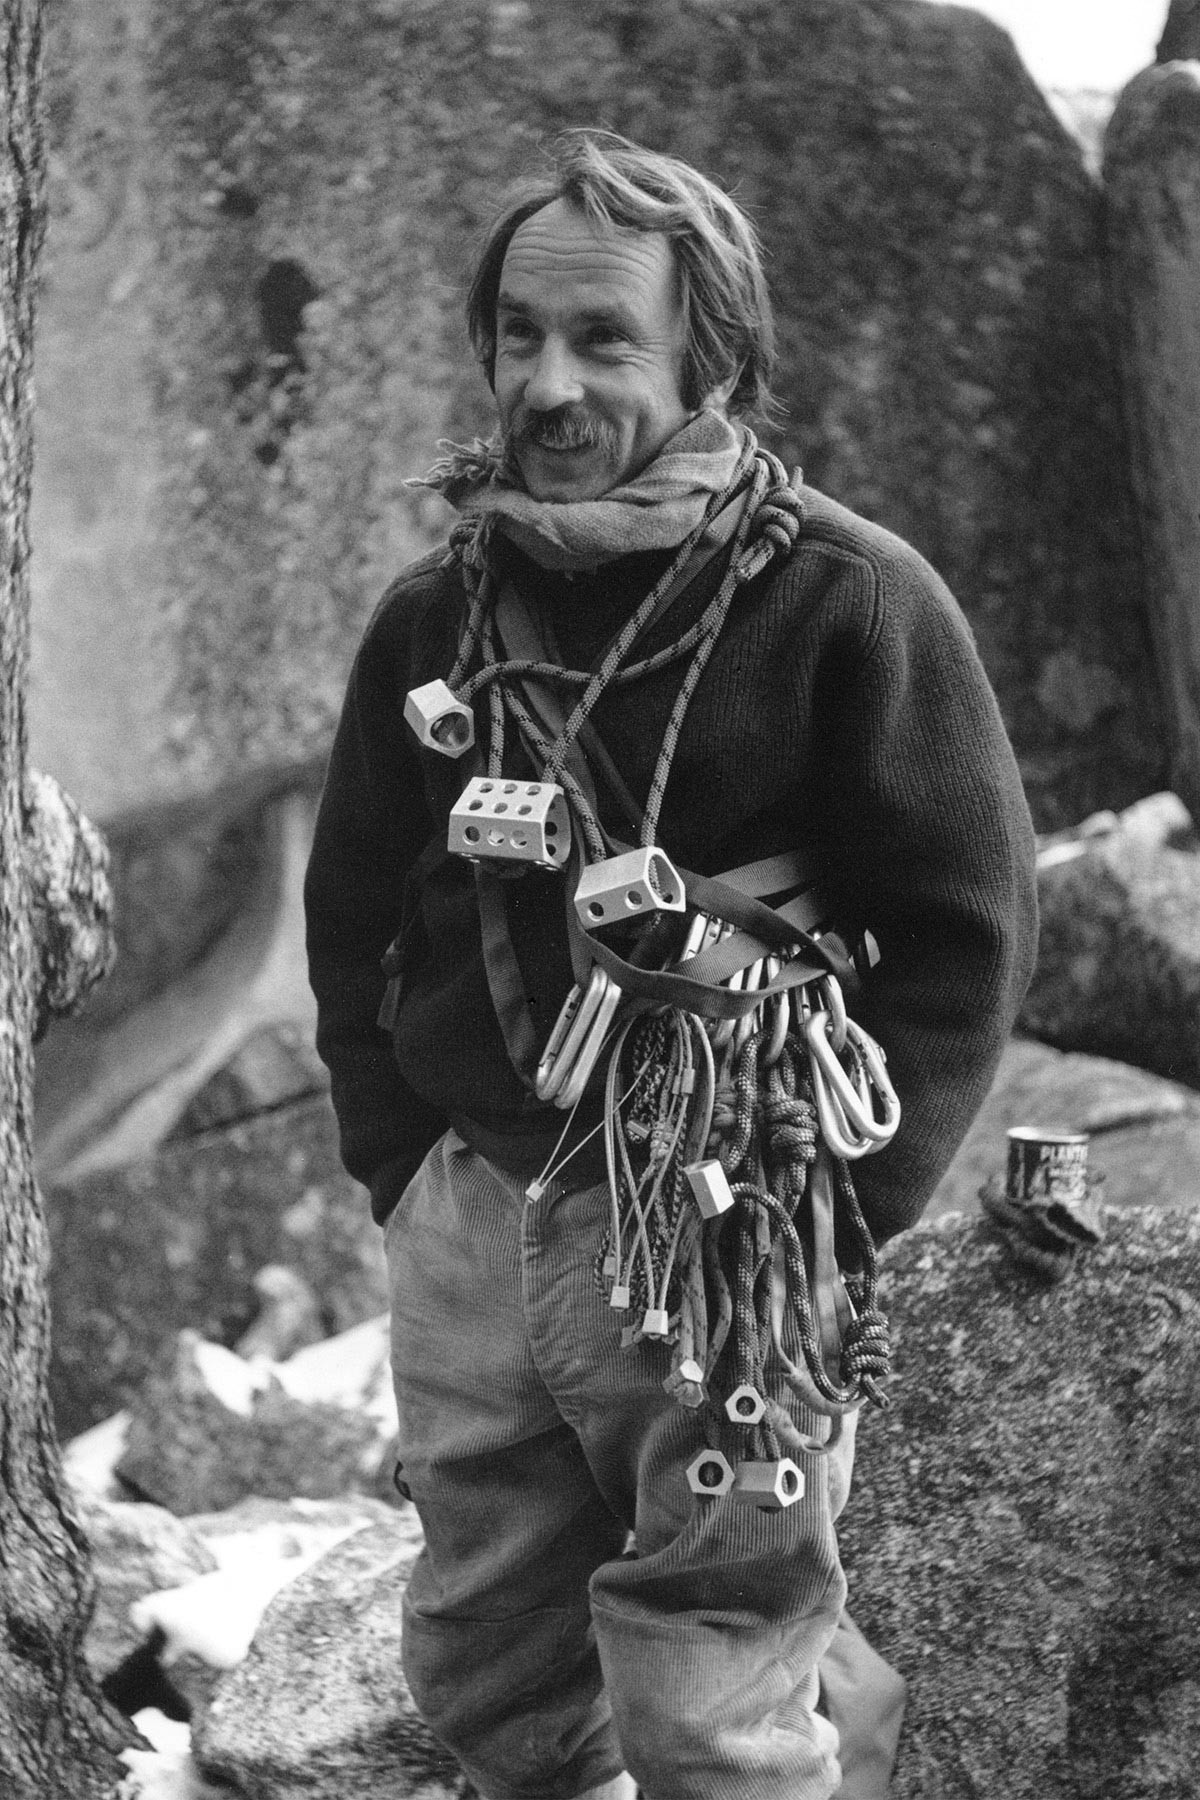 Image of Patagonia founder Yvon Chouinard